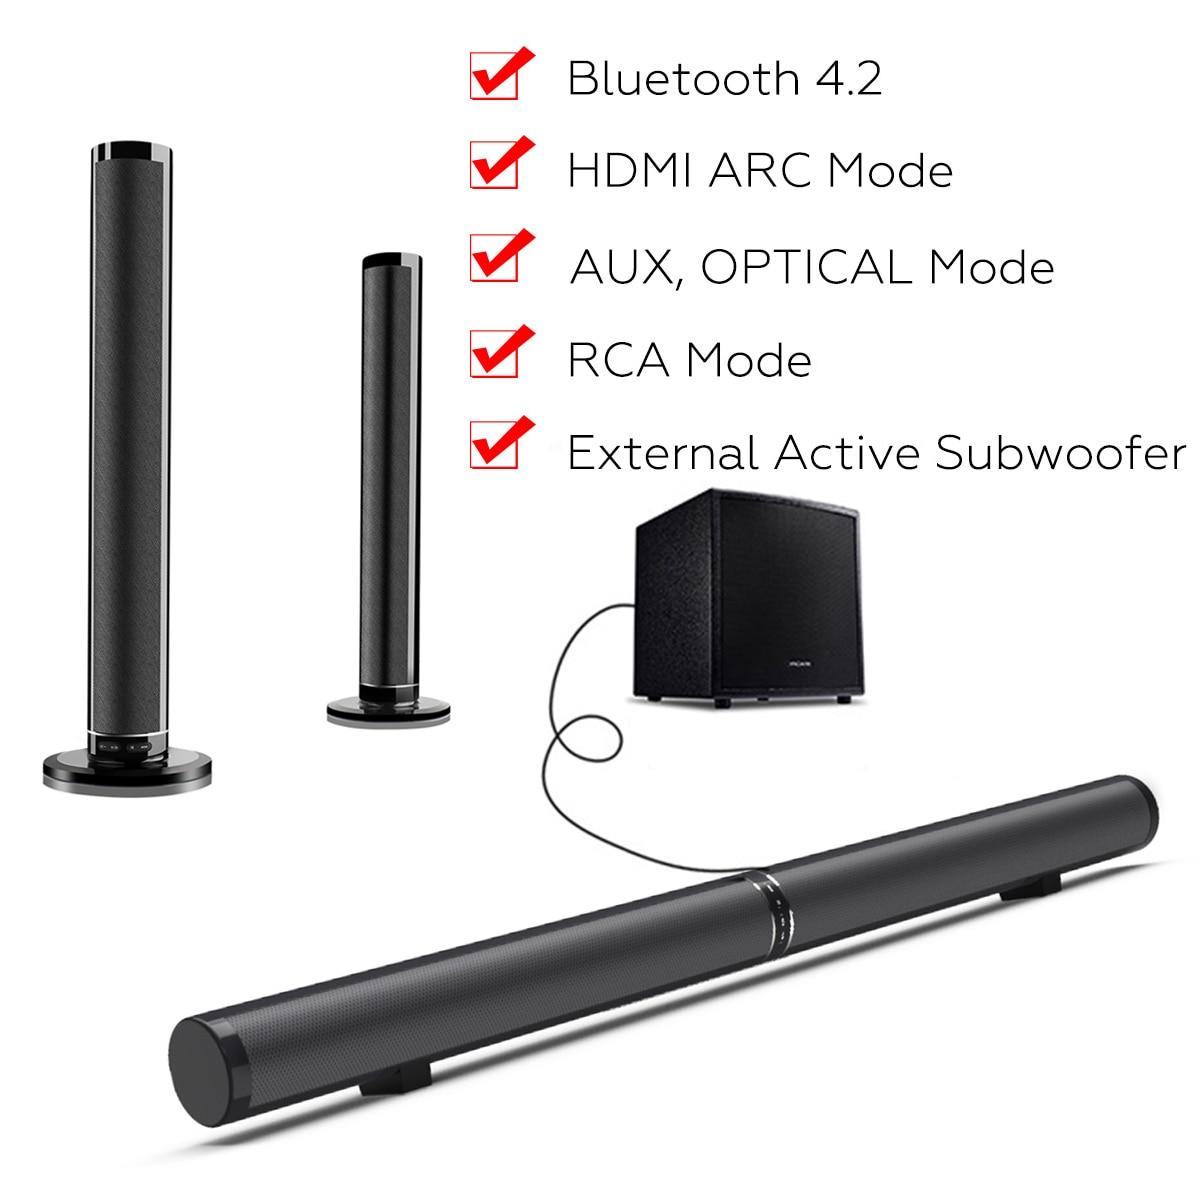 50W Drahtlose bluetooth TV Sound Bar Lautsprecher Sub Woofer Surround Stereo Home Theatre System Computer Wand Soundbar